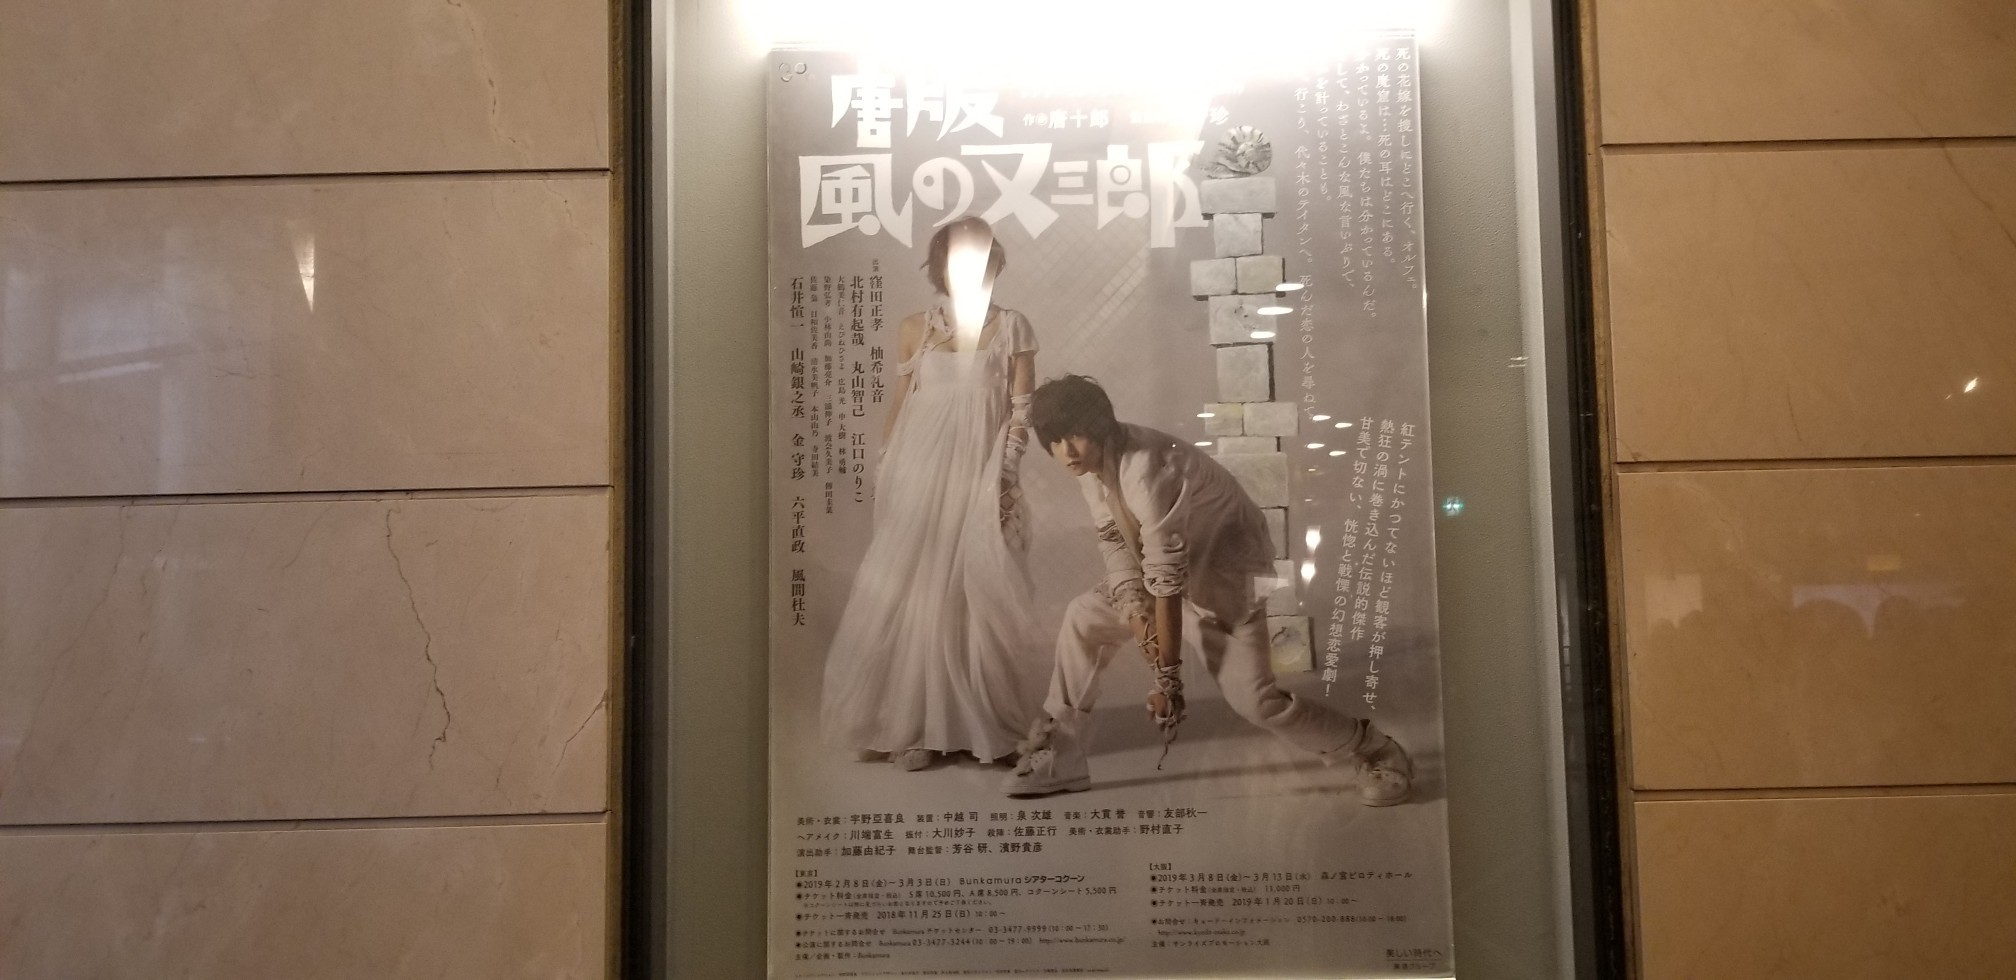 ♪2019★観劇模様etc(風の又三郎)_d0162225_14125812.jpg